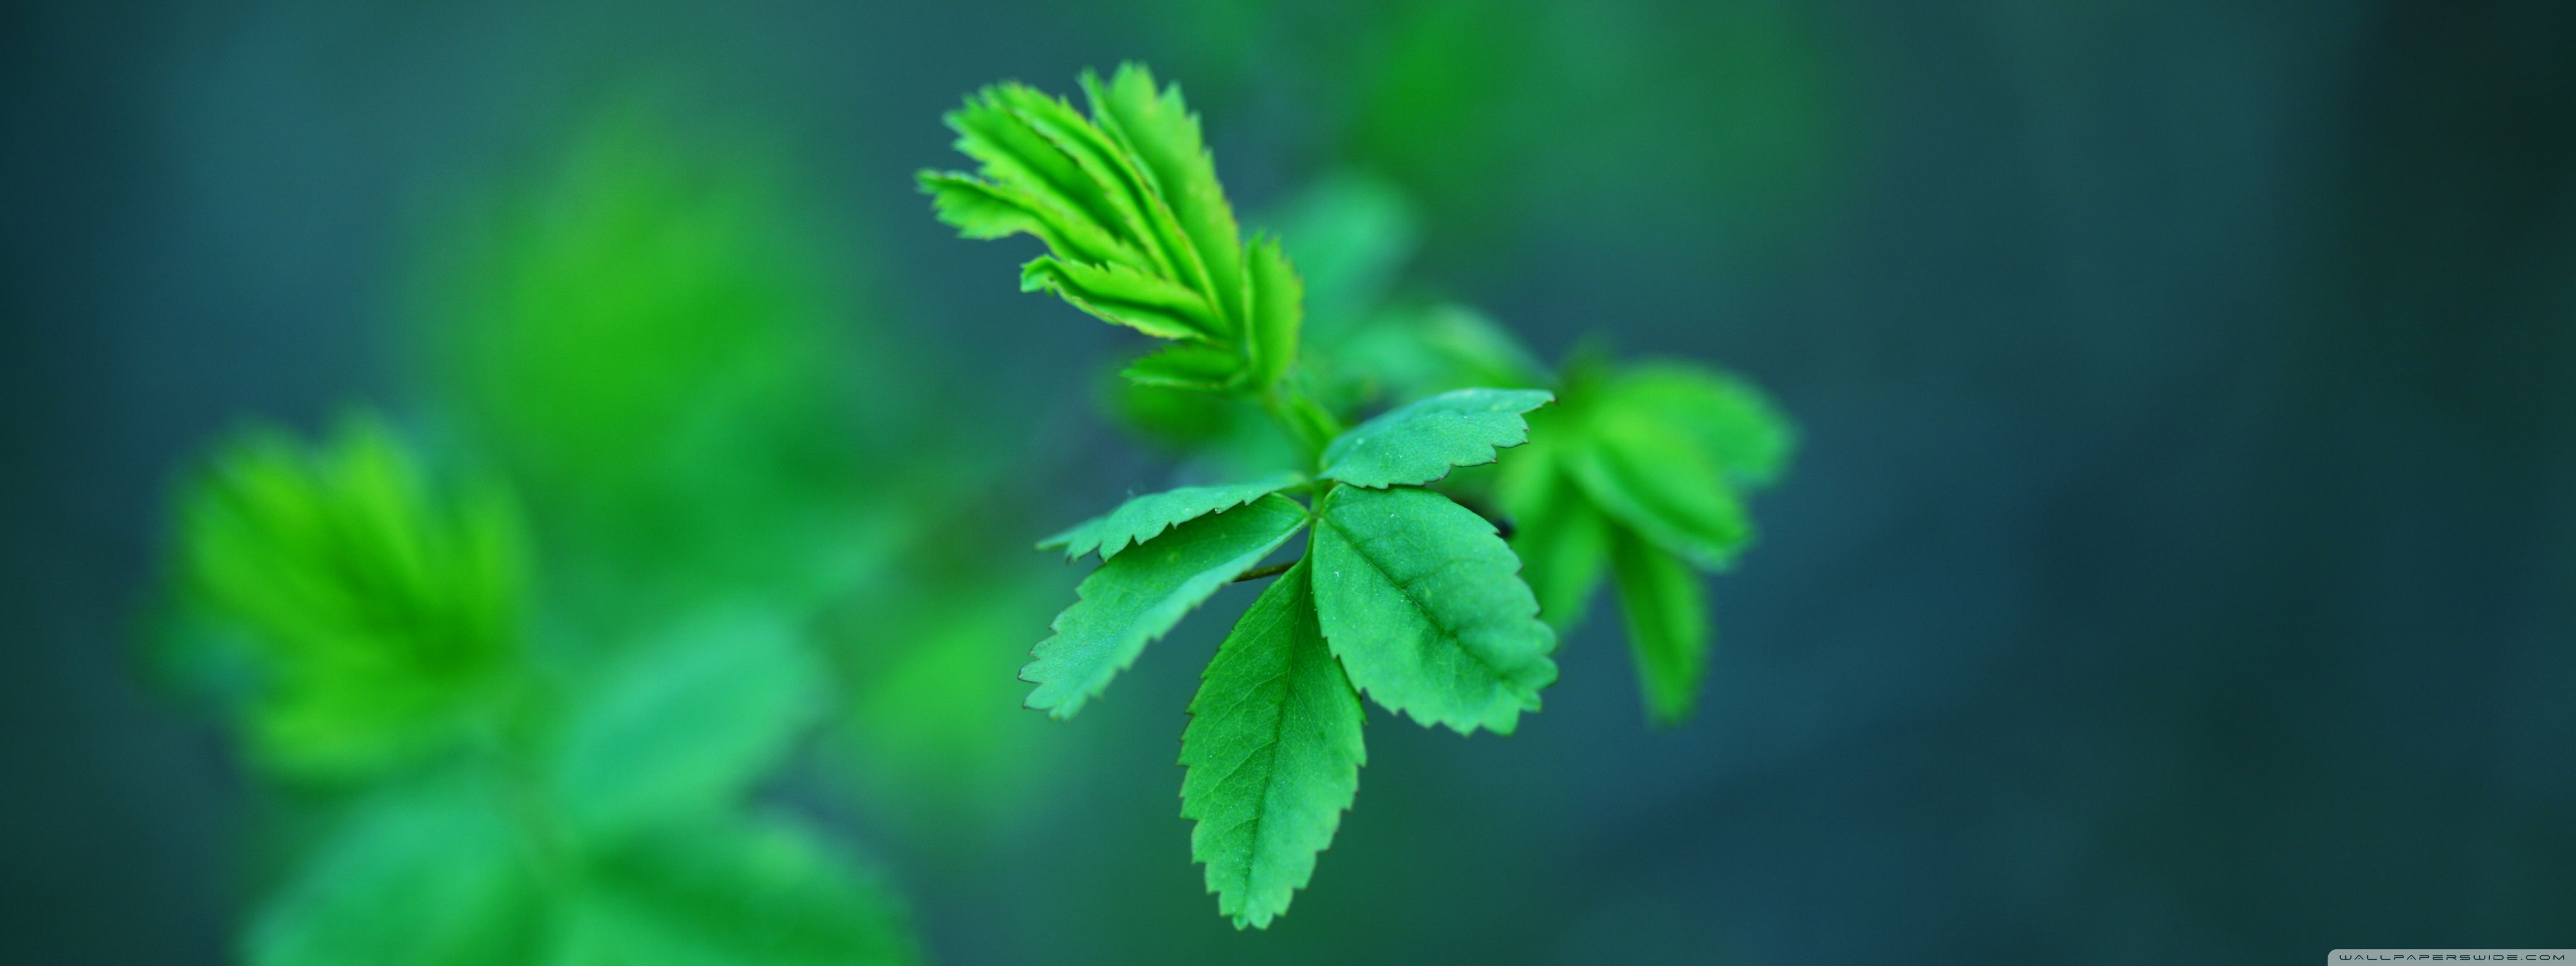 Green Spring Leaves HD desktop wallpaper High Definition